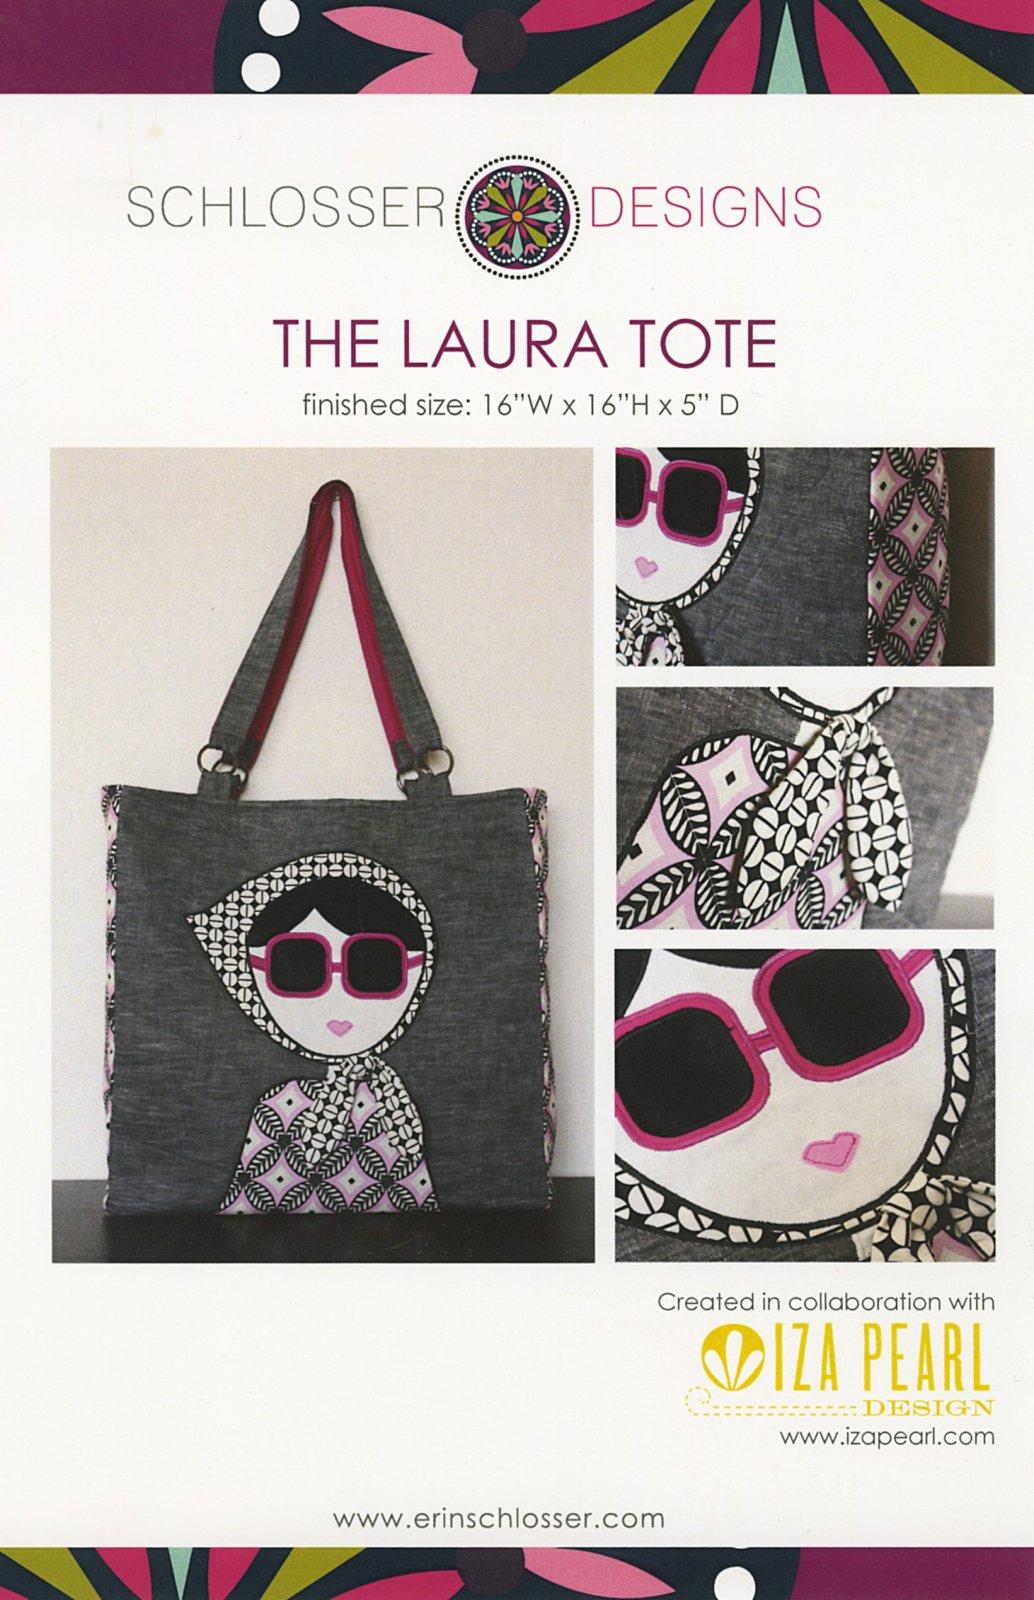 Laura Tote